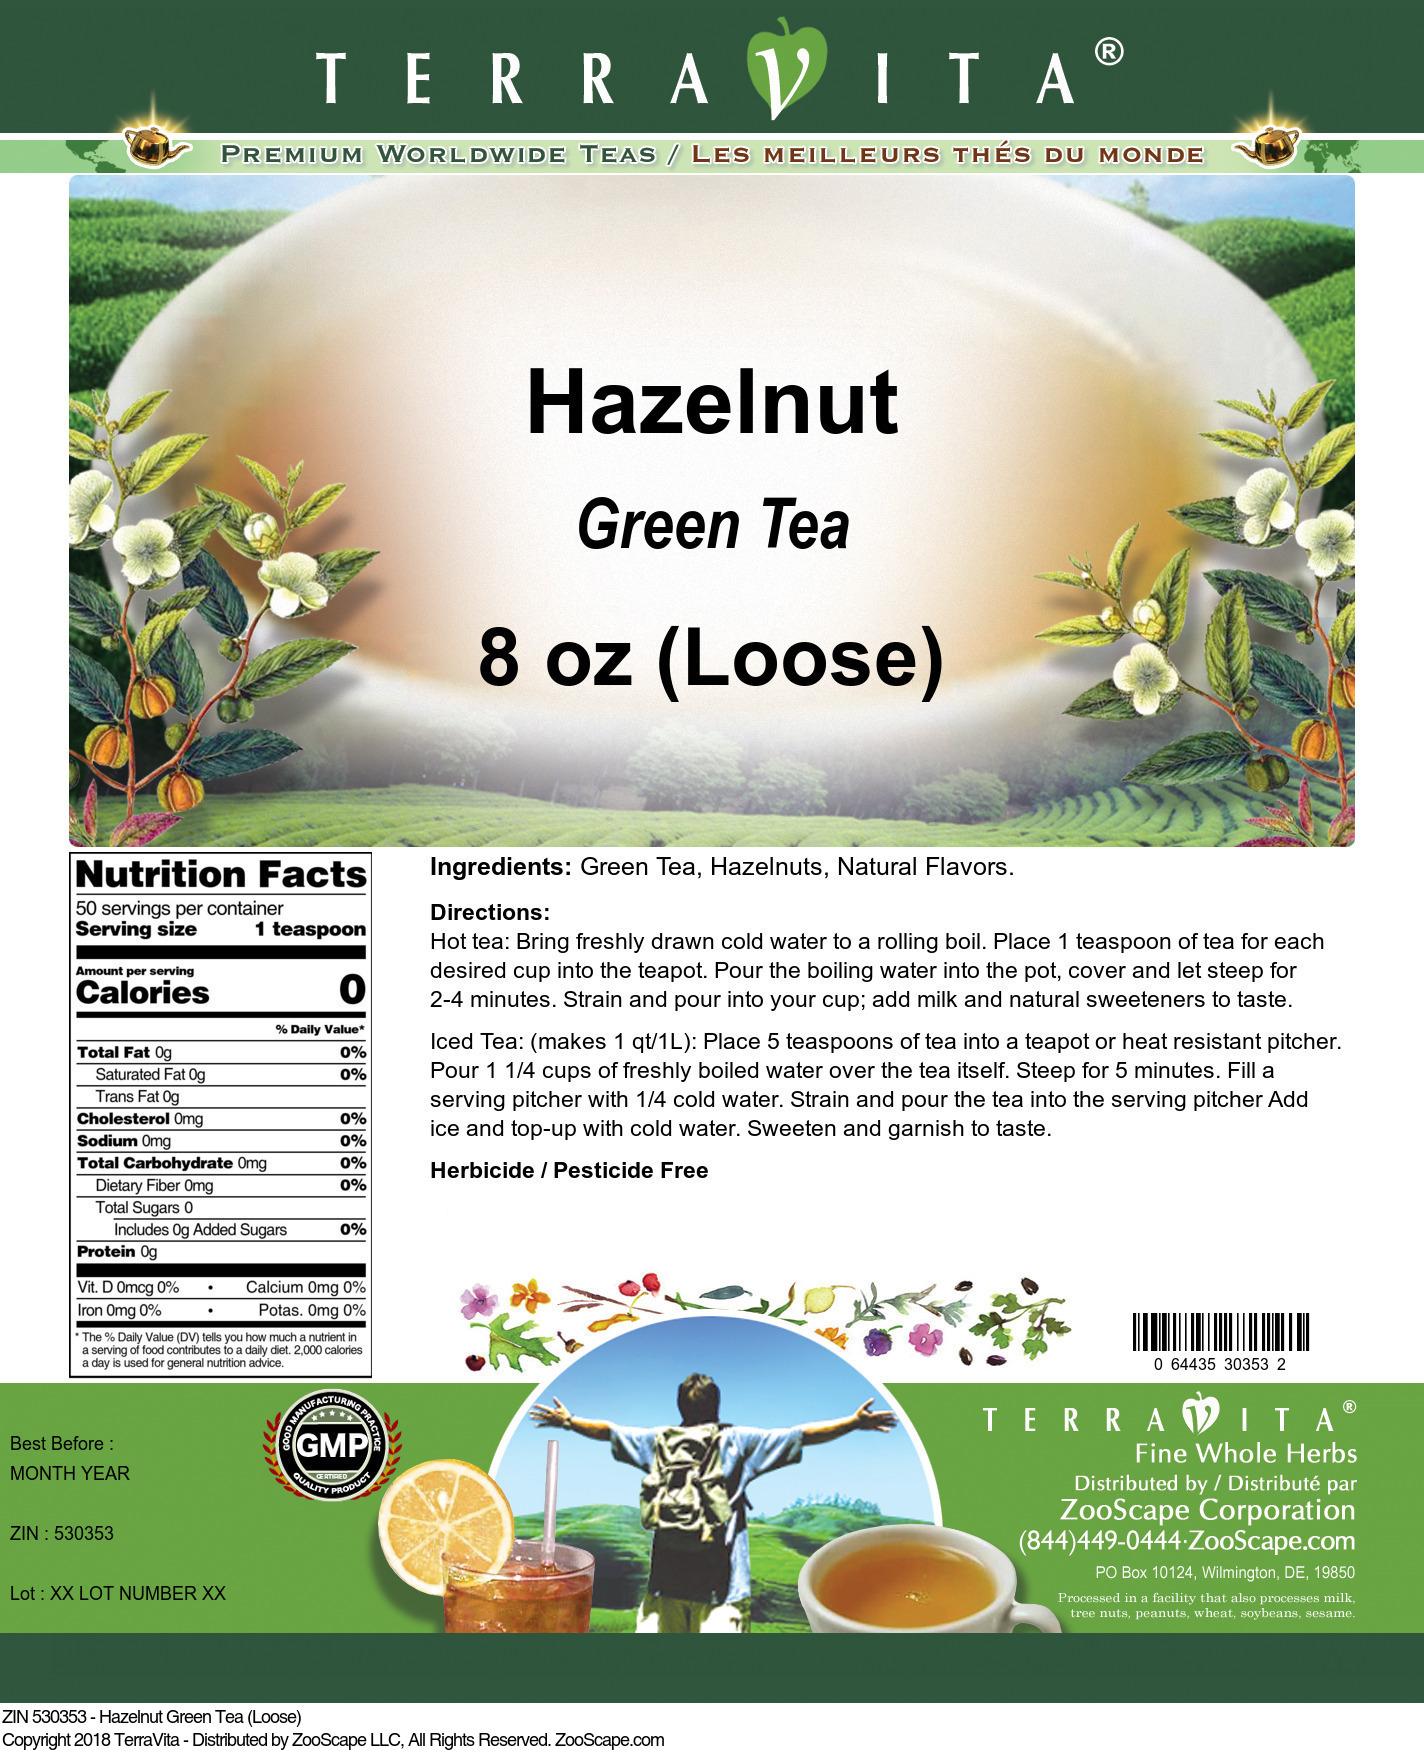 Hazelnut Green Tea